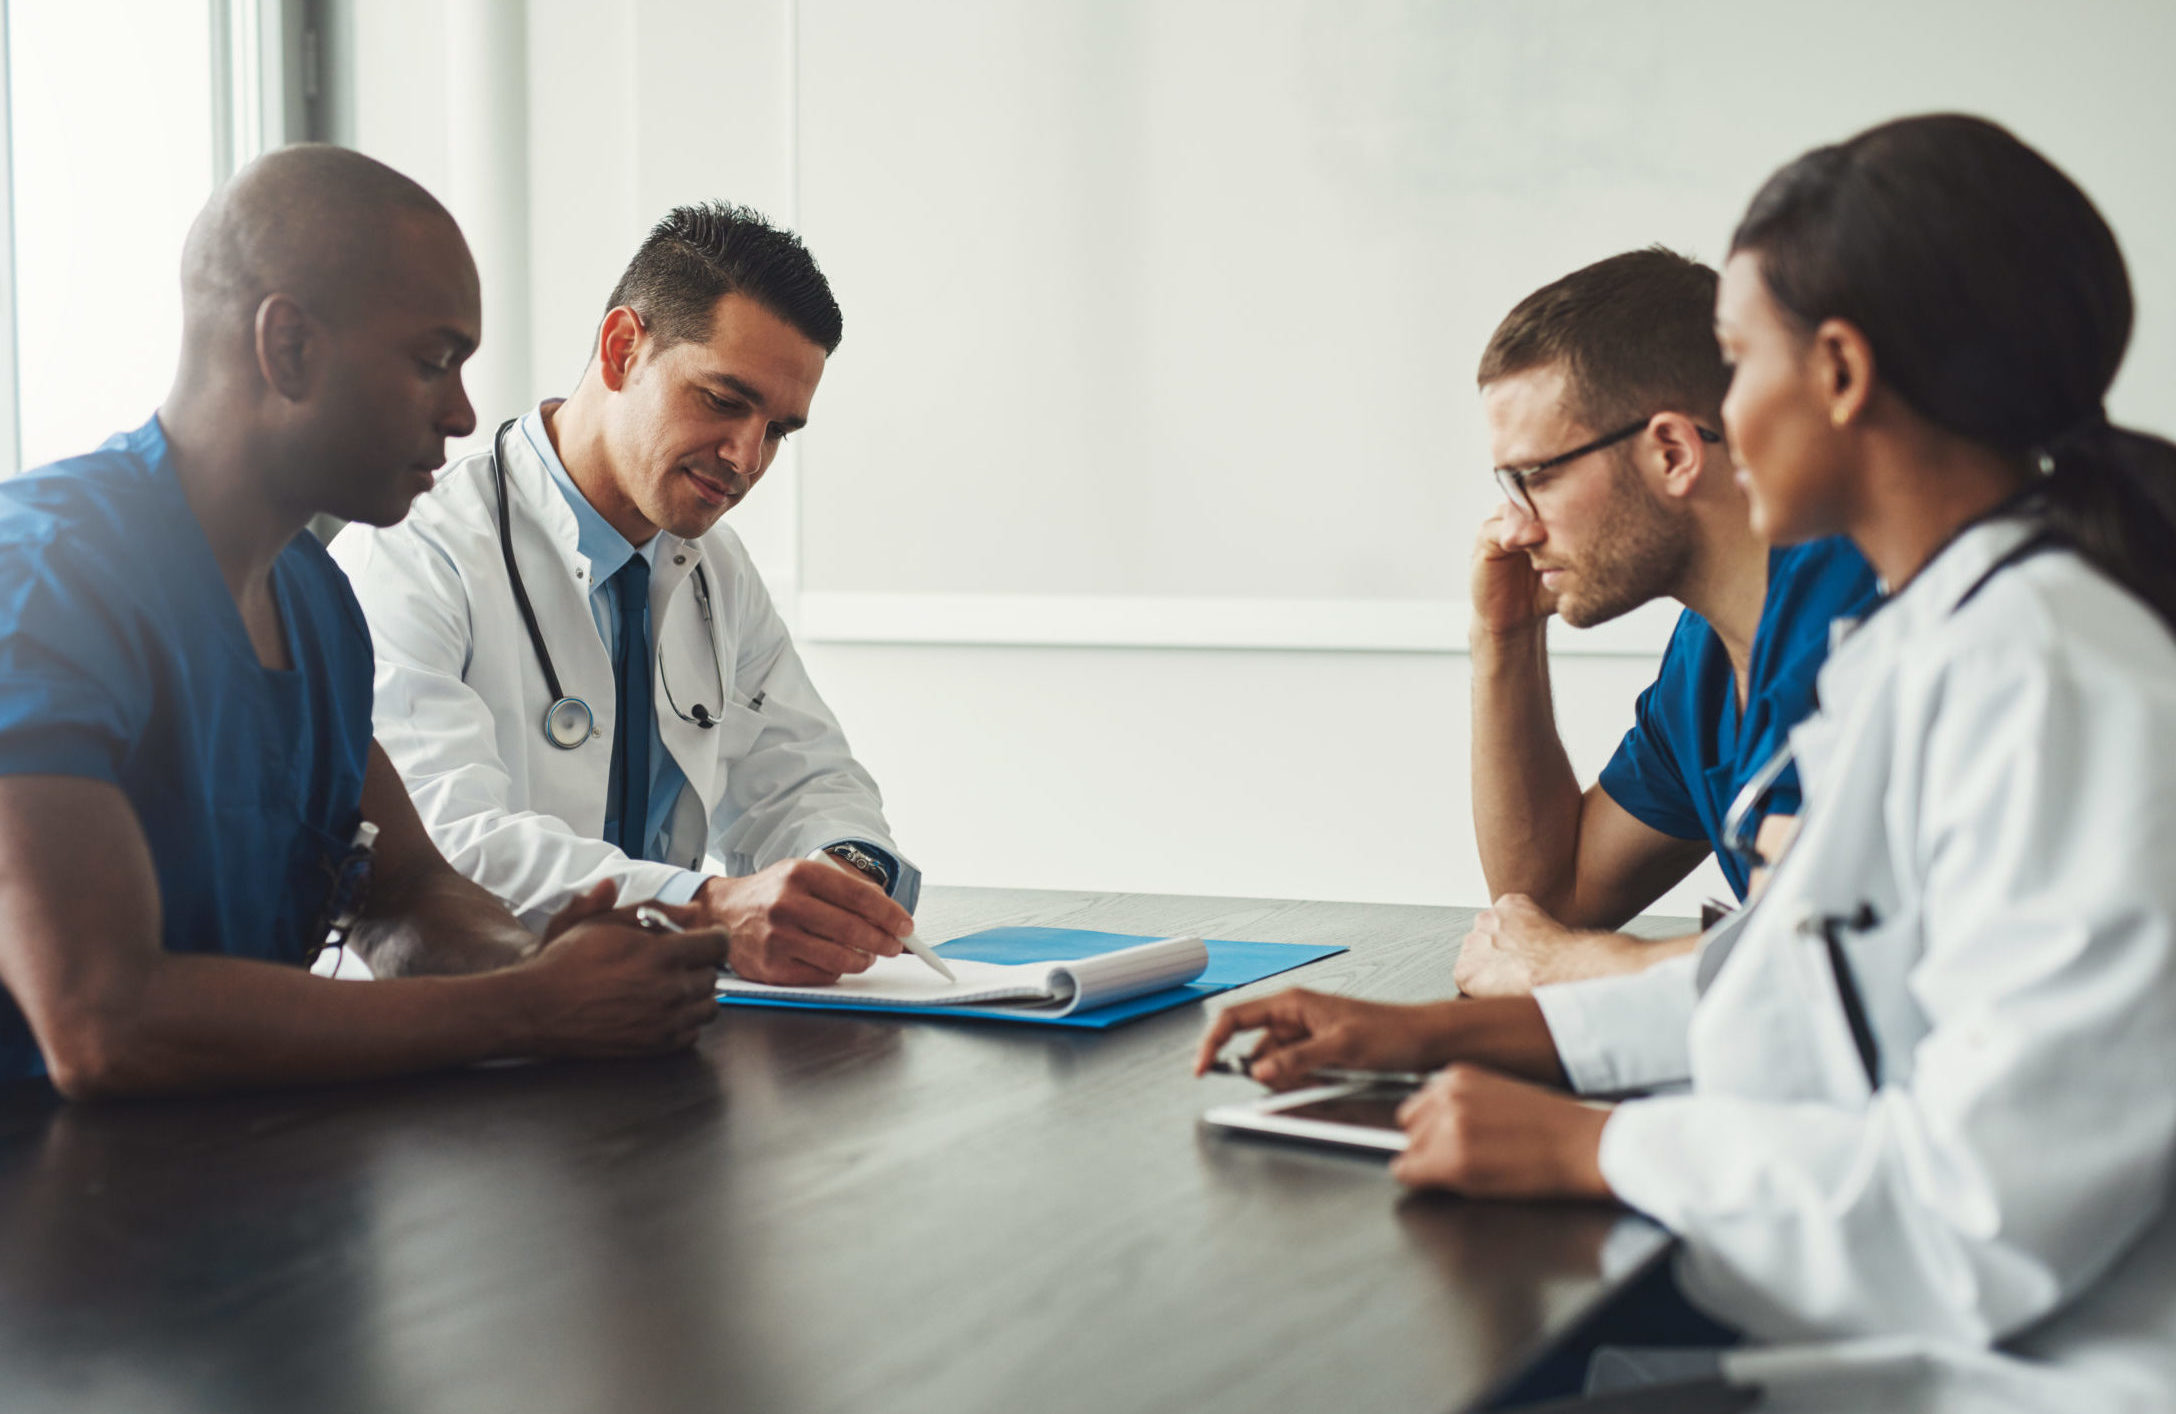 Equipe de médecin en réunion